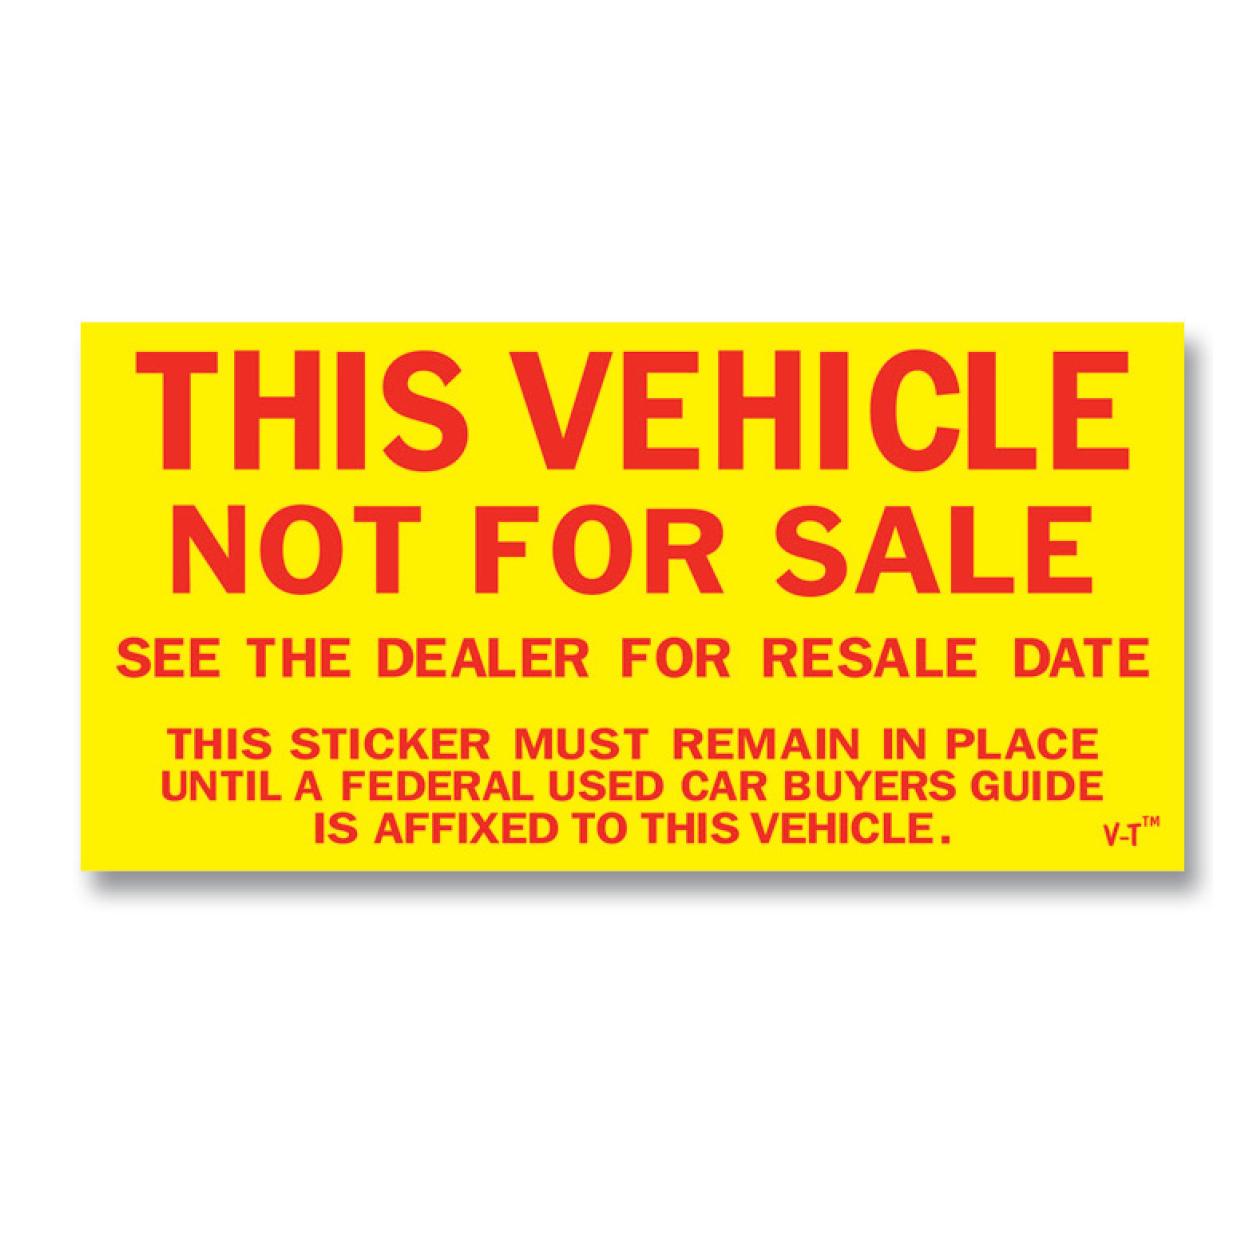 Not for sale outside windshield sticker